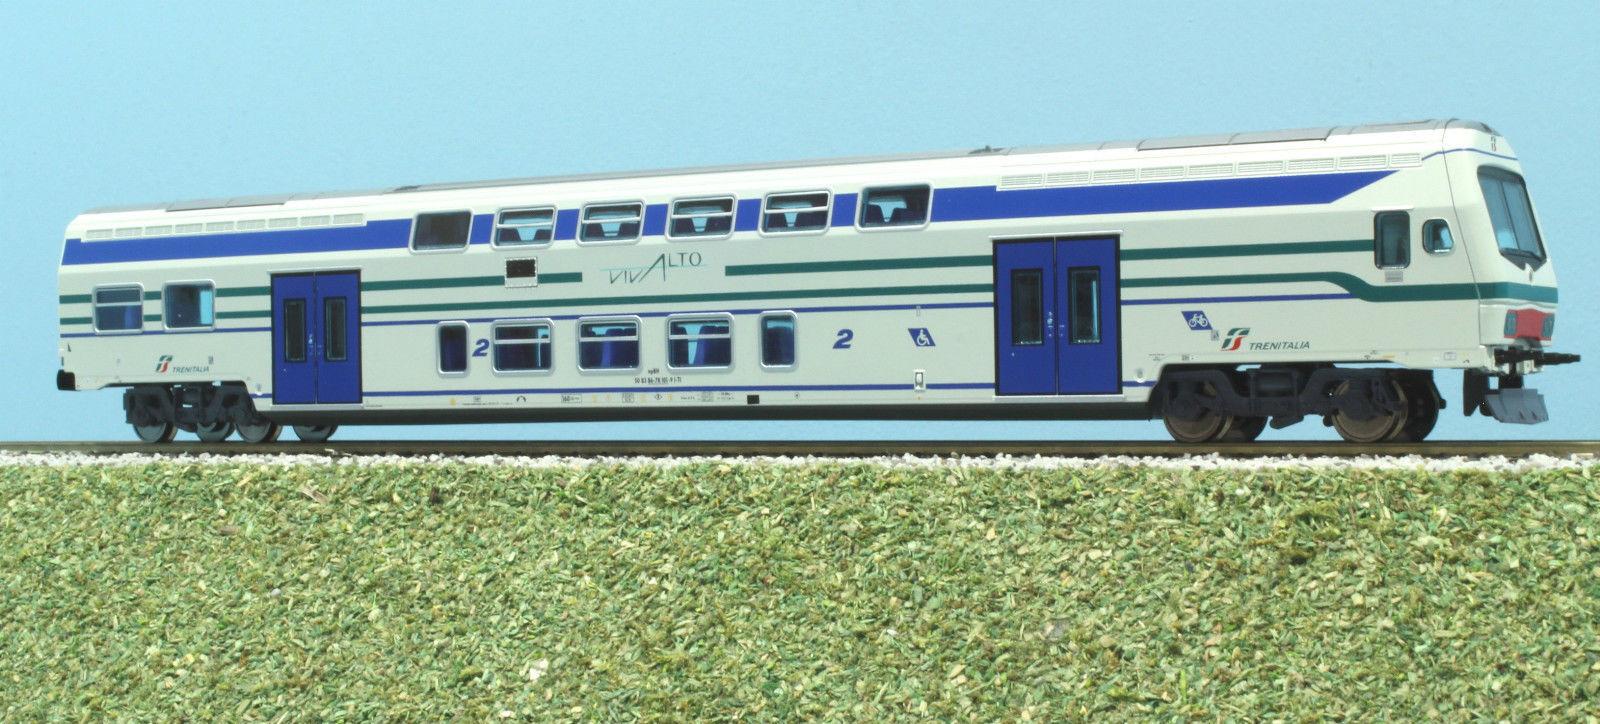 VI TRAINS 3115L Pilot 2a cl livery white bands green bluee,lit